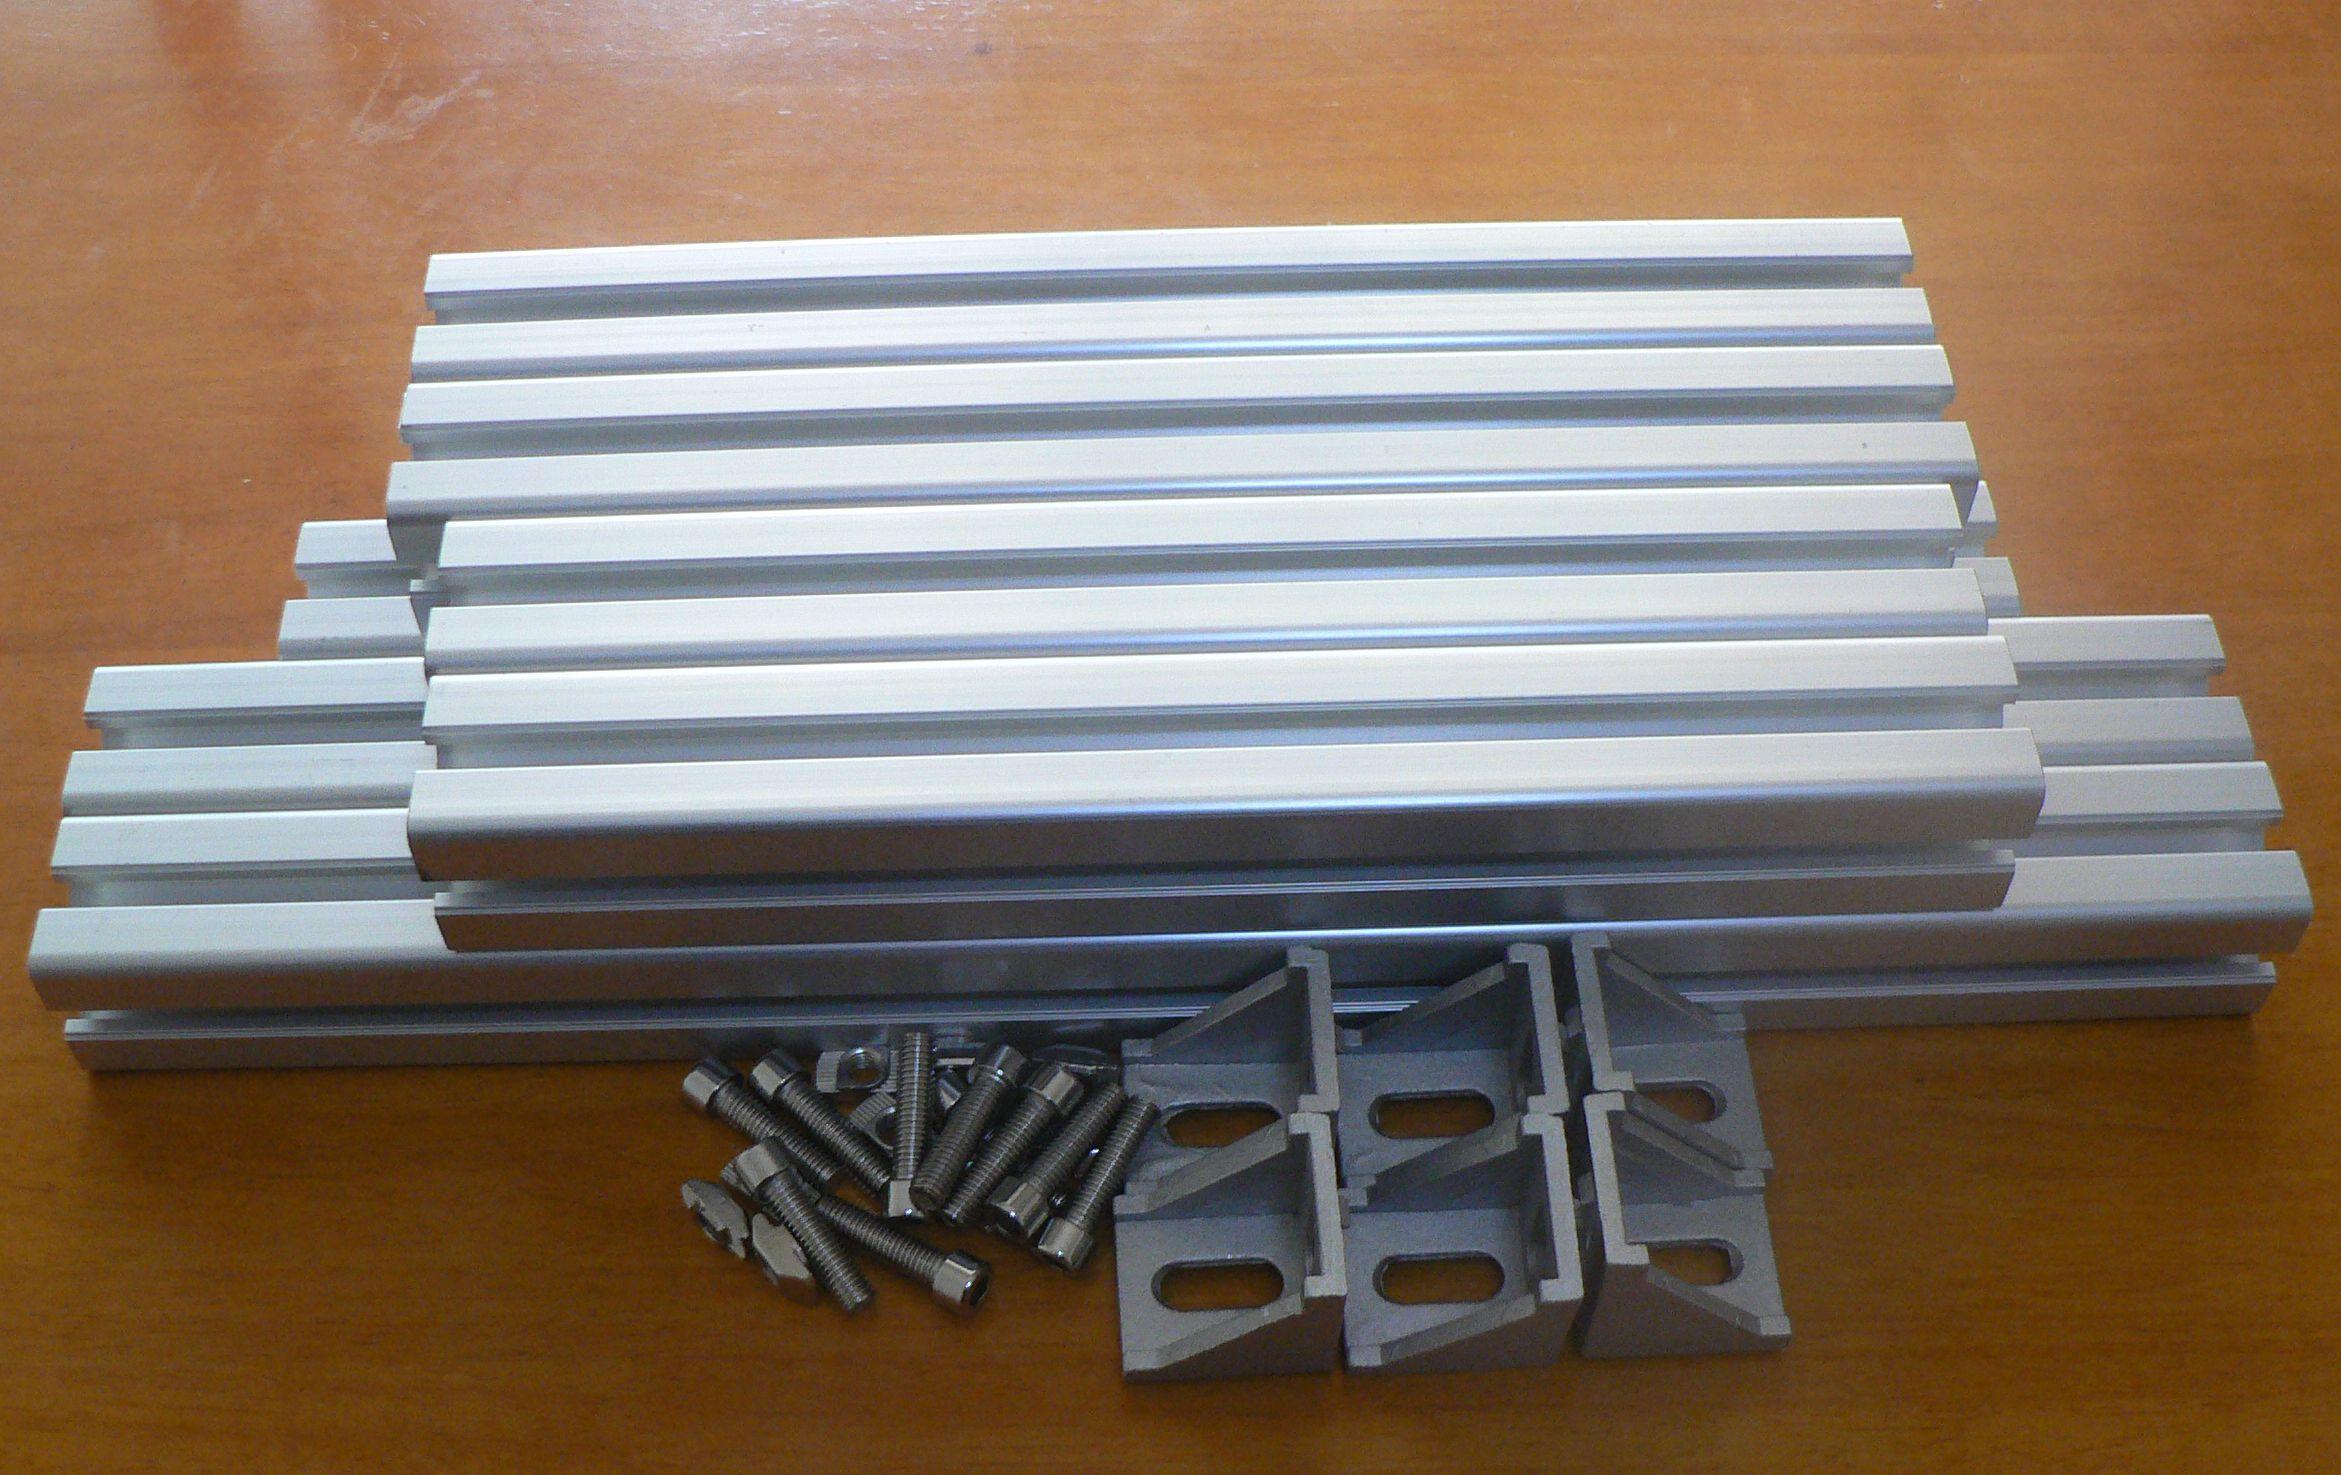 dlp 3d printer parts form1 dlp 3d printer aluminum alloy frame